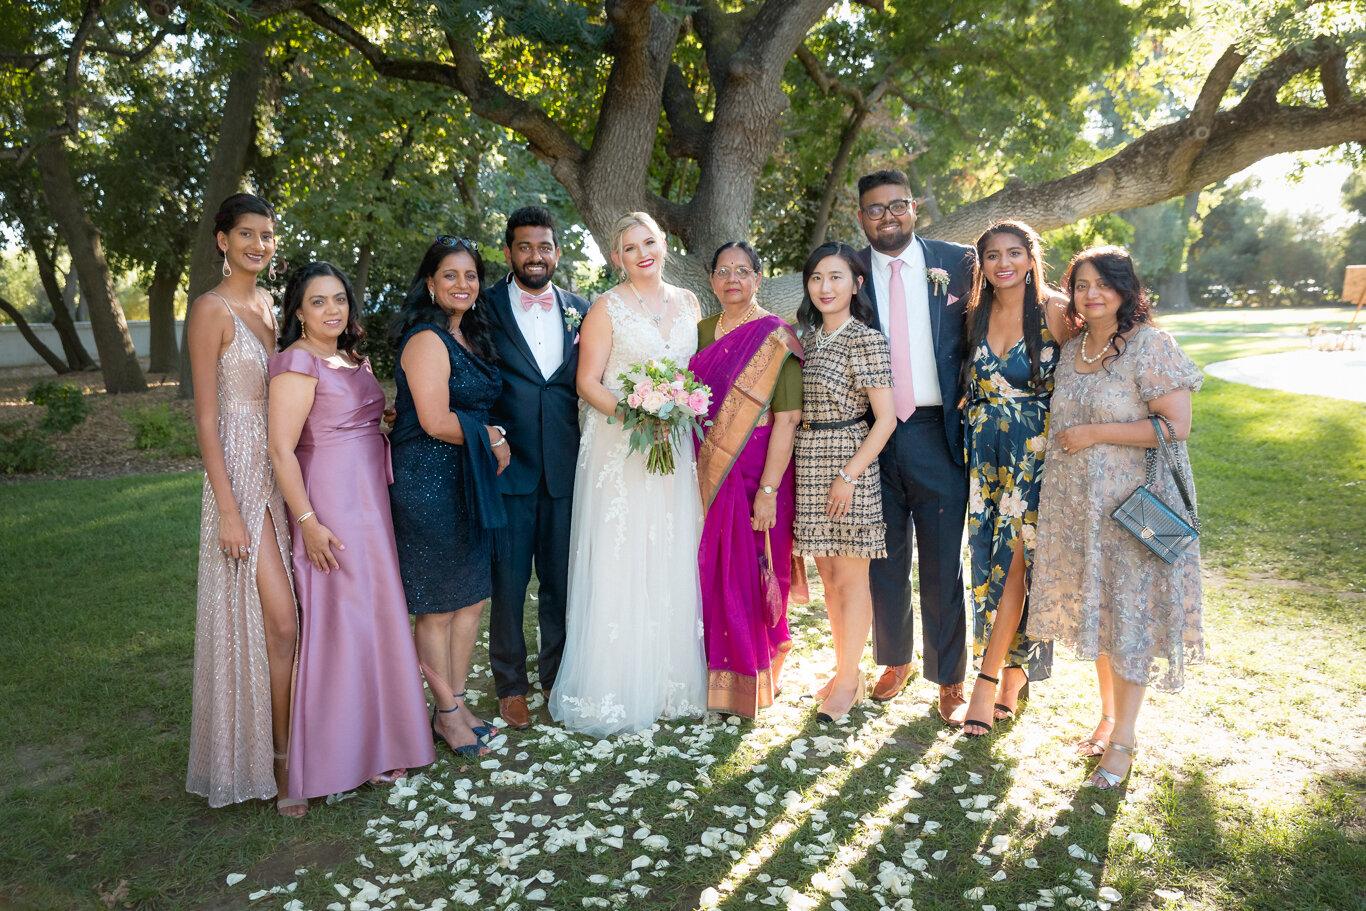 2019.08.24_Emily-Ashir-Wedding-at-the-Maples-5971.jpg